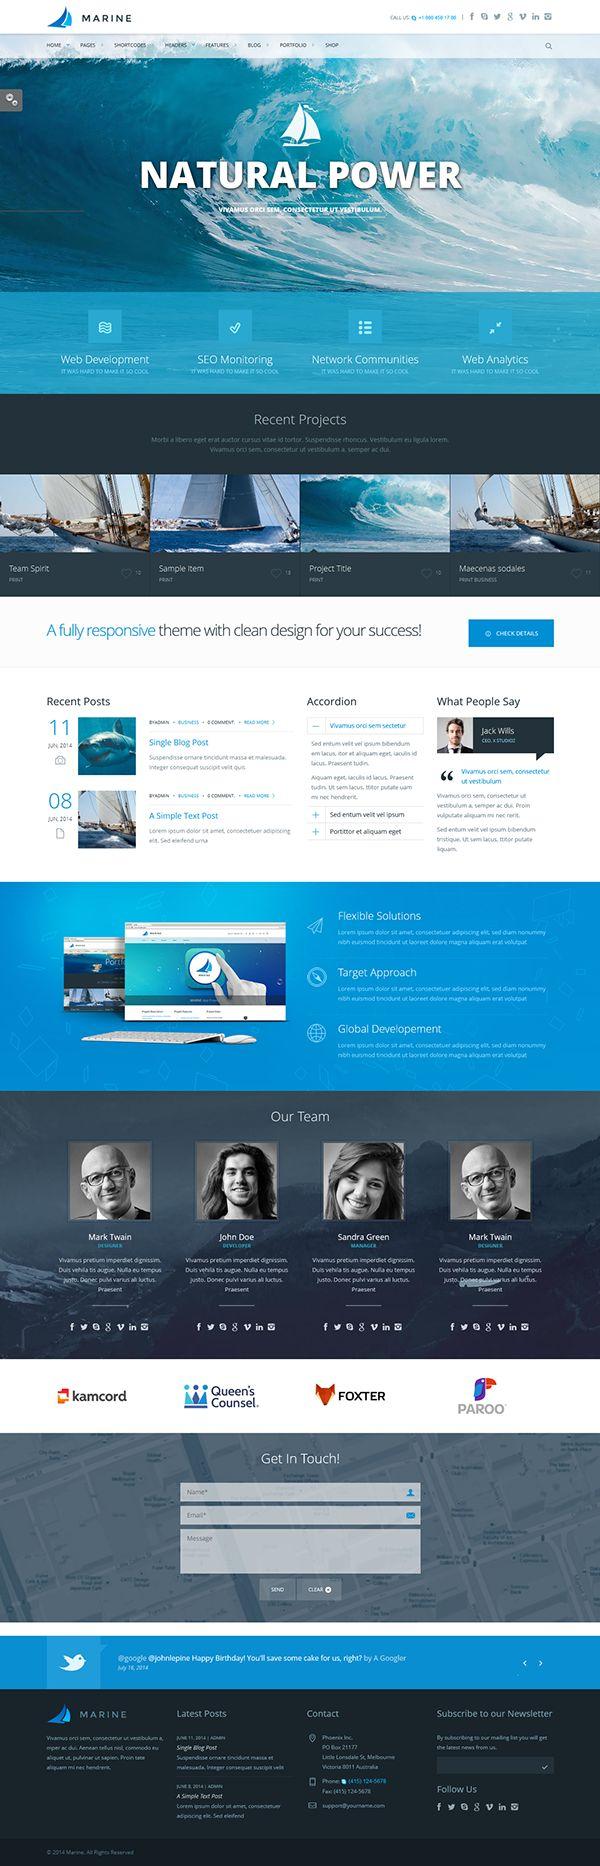 Marine - Retina Responsive Multi-Purpose Theme by CreAtive Web Themes, via Behance